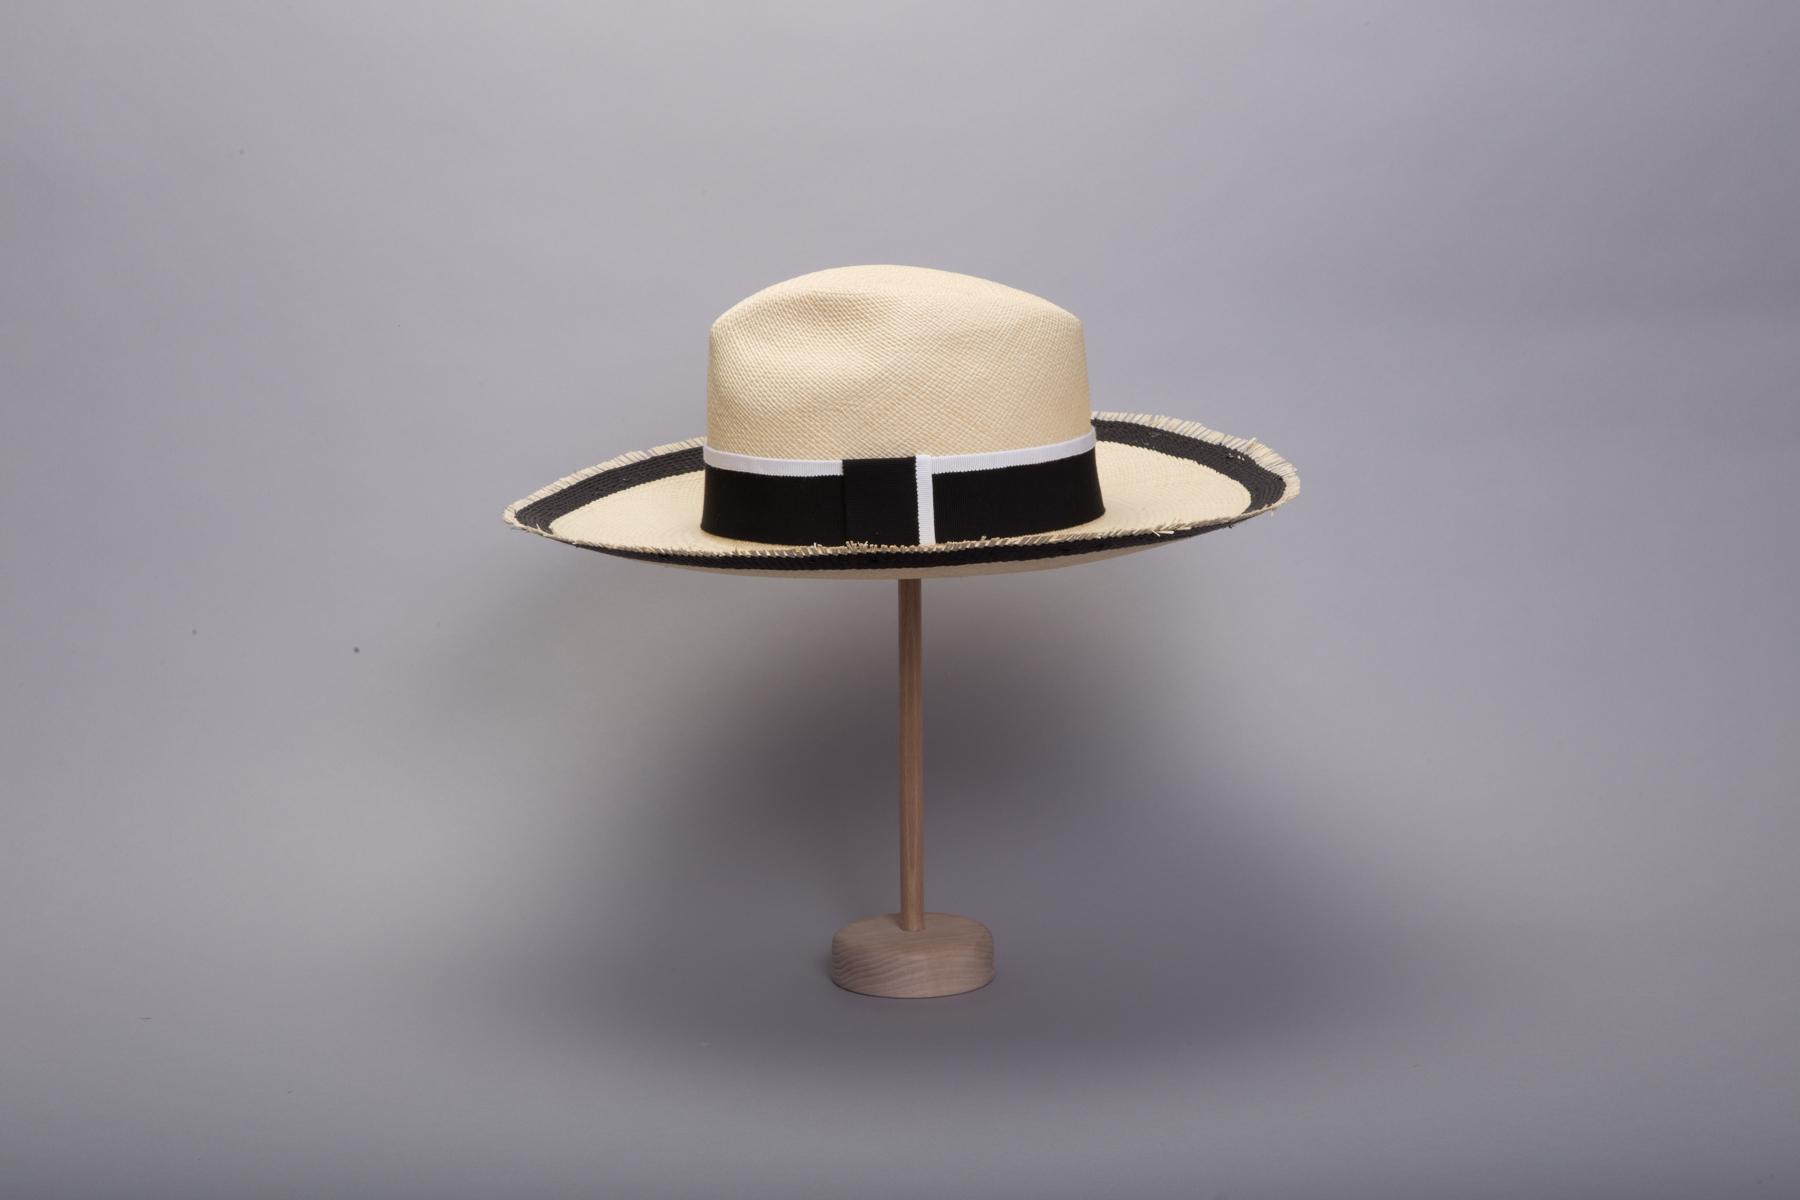 chapeau-panama-sainttropez-gif2-450x300